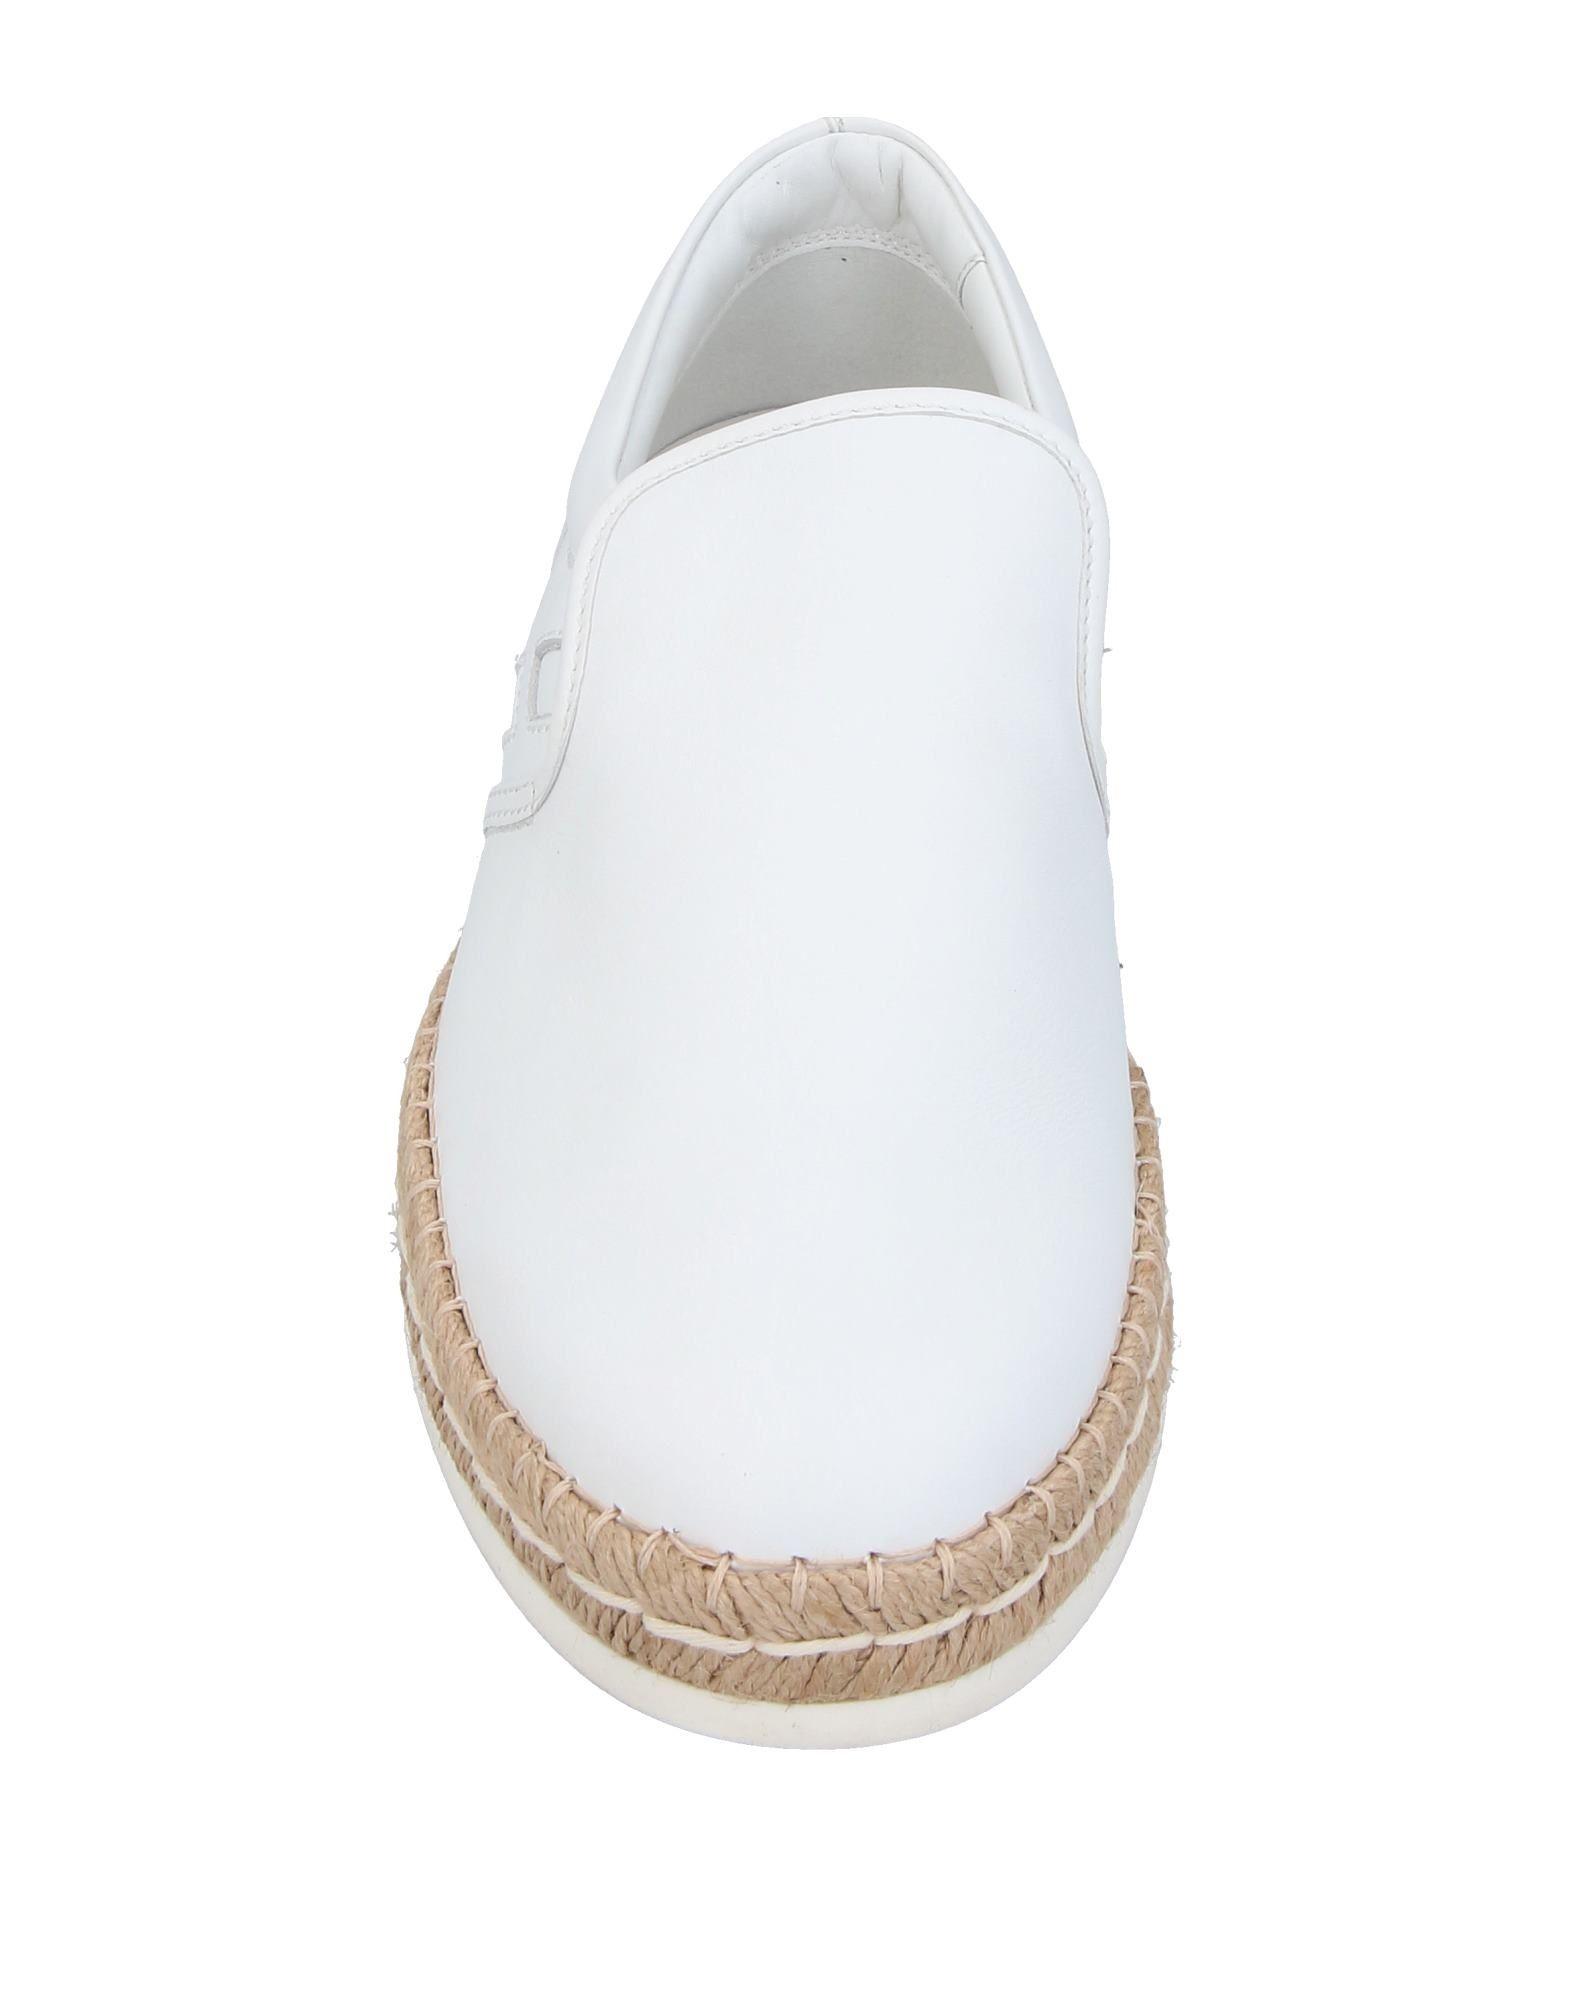 Hogan Rebel Sneakers Herren  11397718RX Gute Qualität beliebte Schuhe